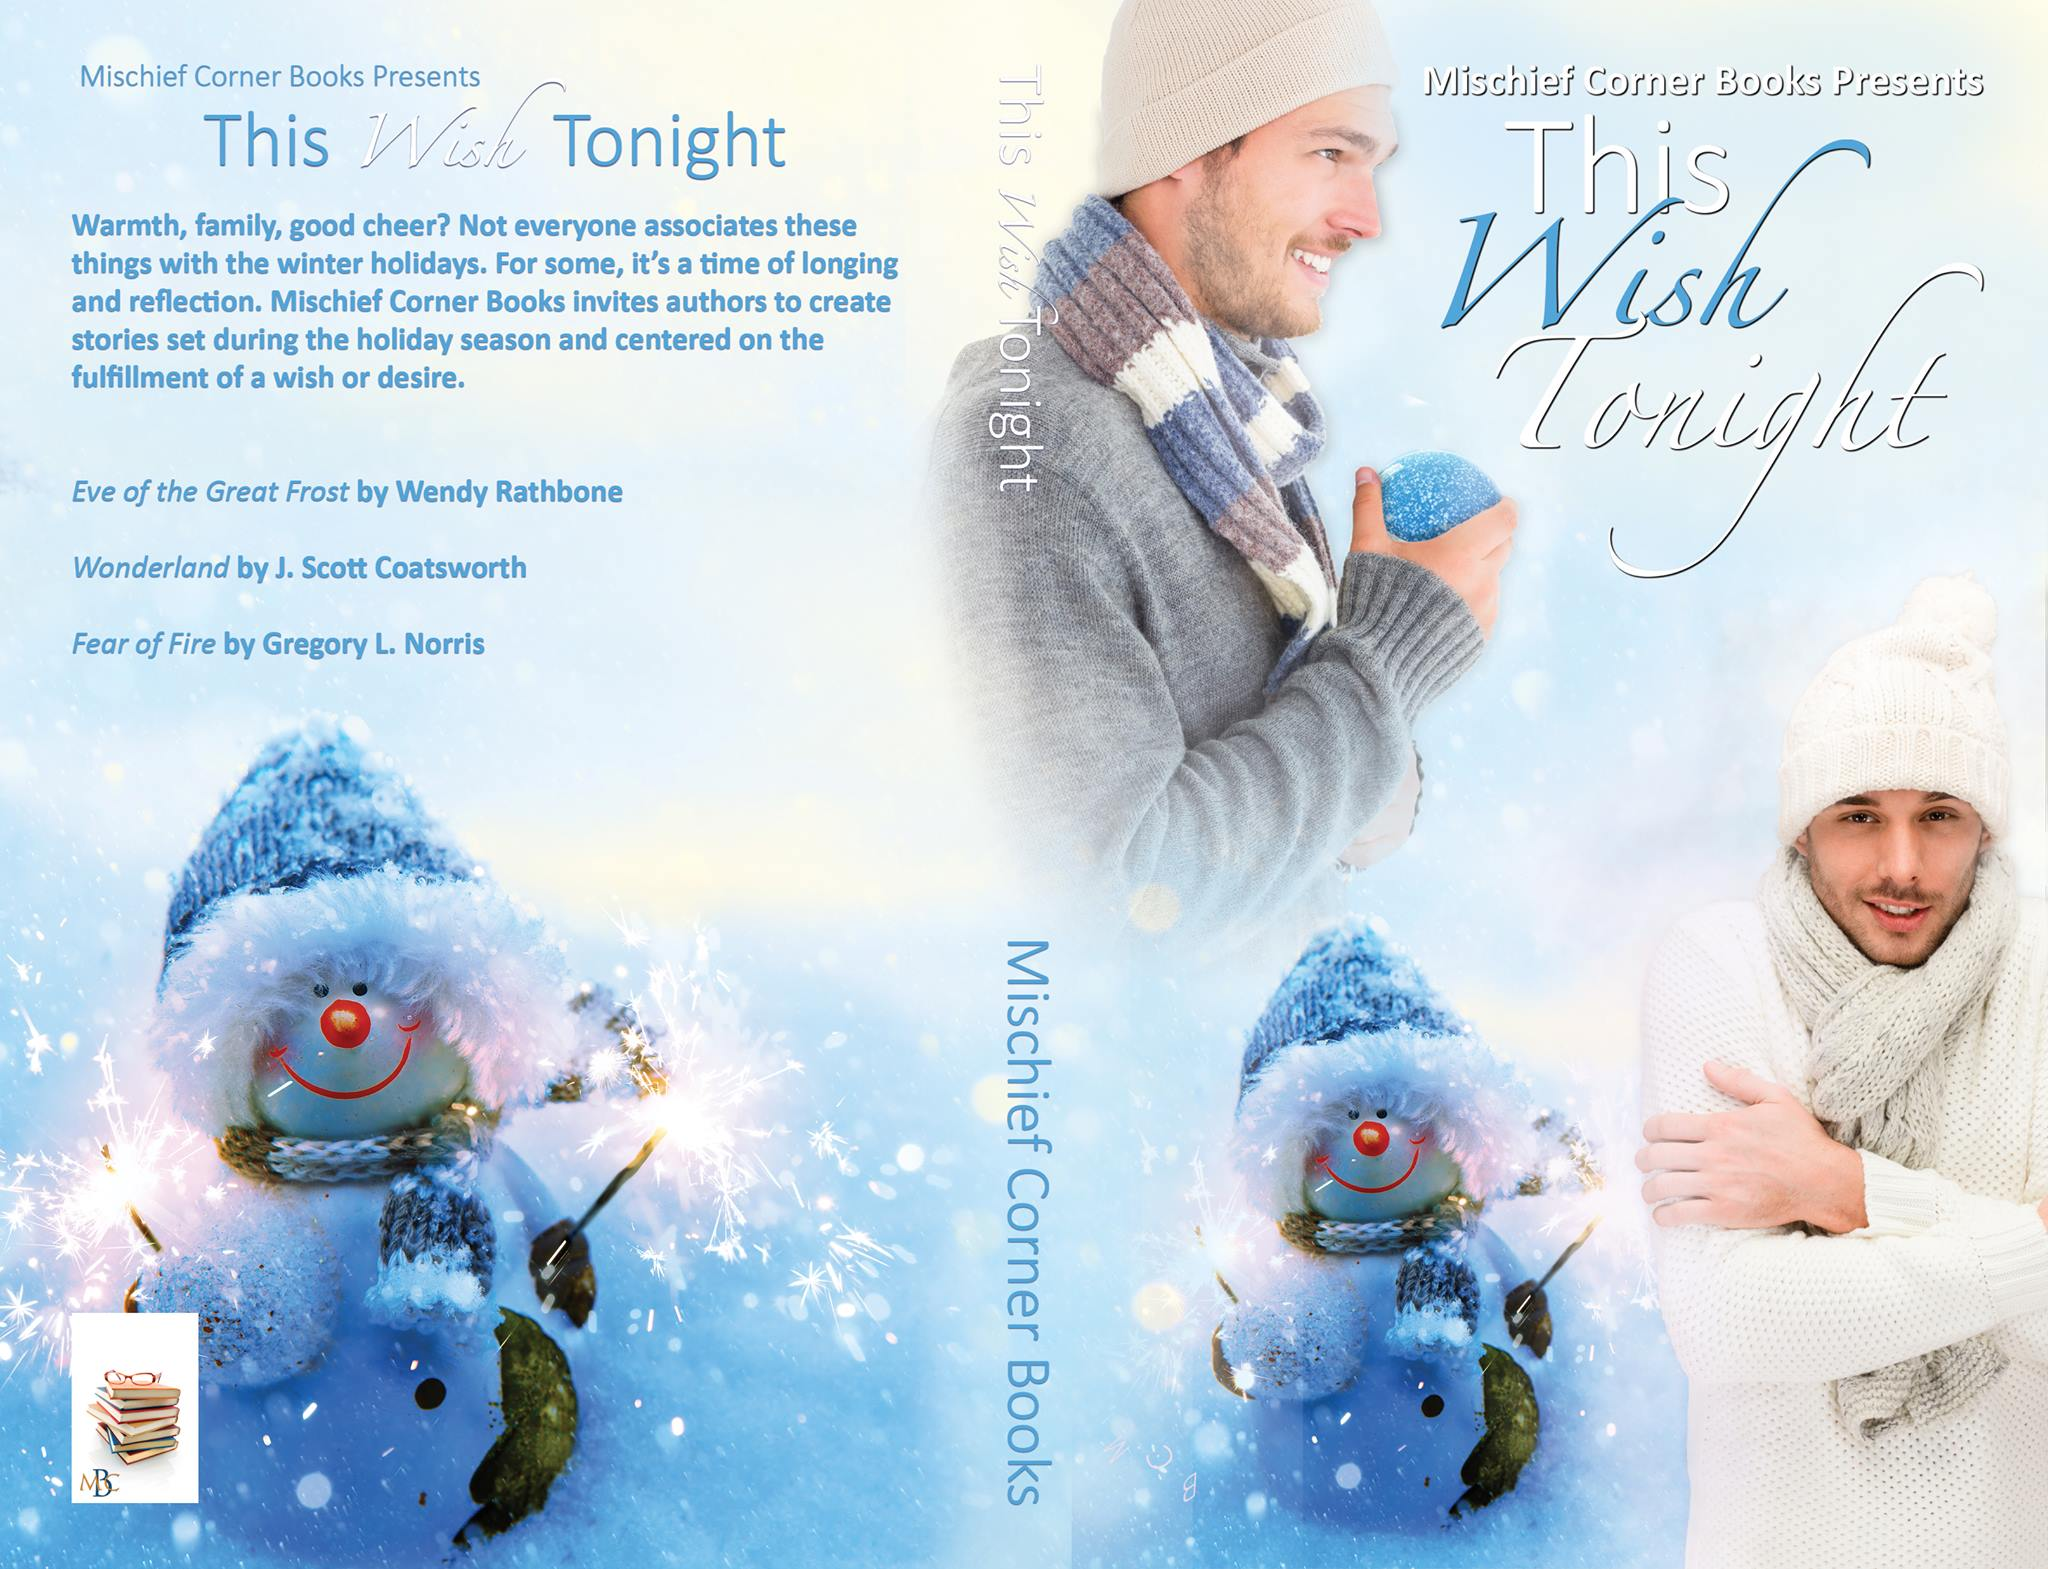 BLOG TOUR: This Wish Tonight by Gregory L. Norris, J. Scott Coatsworth & Wendy Rathbone